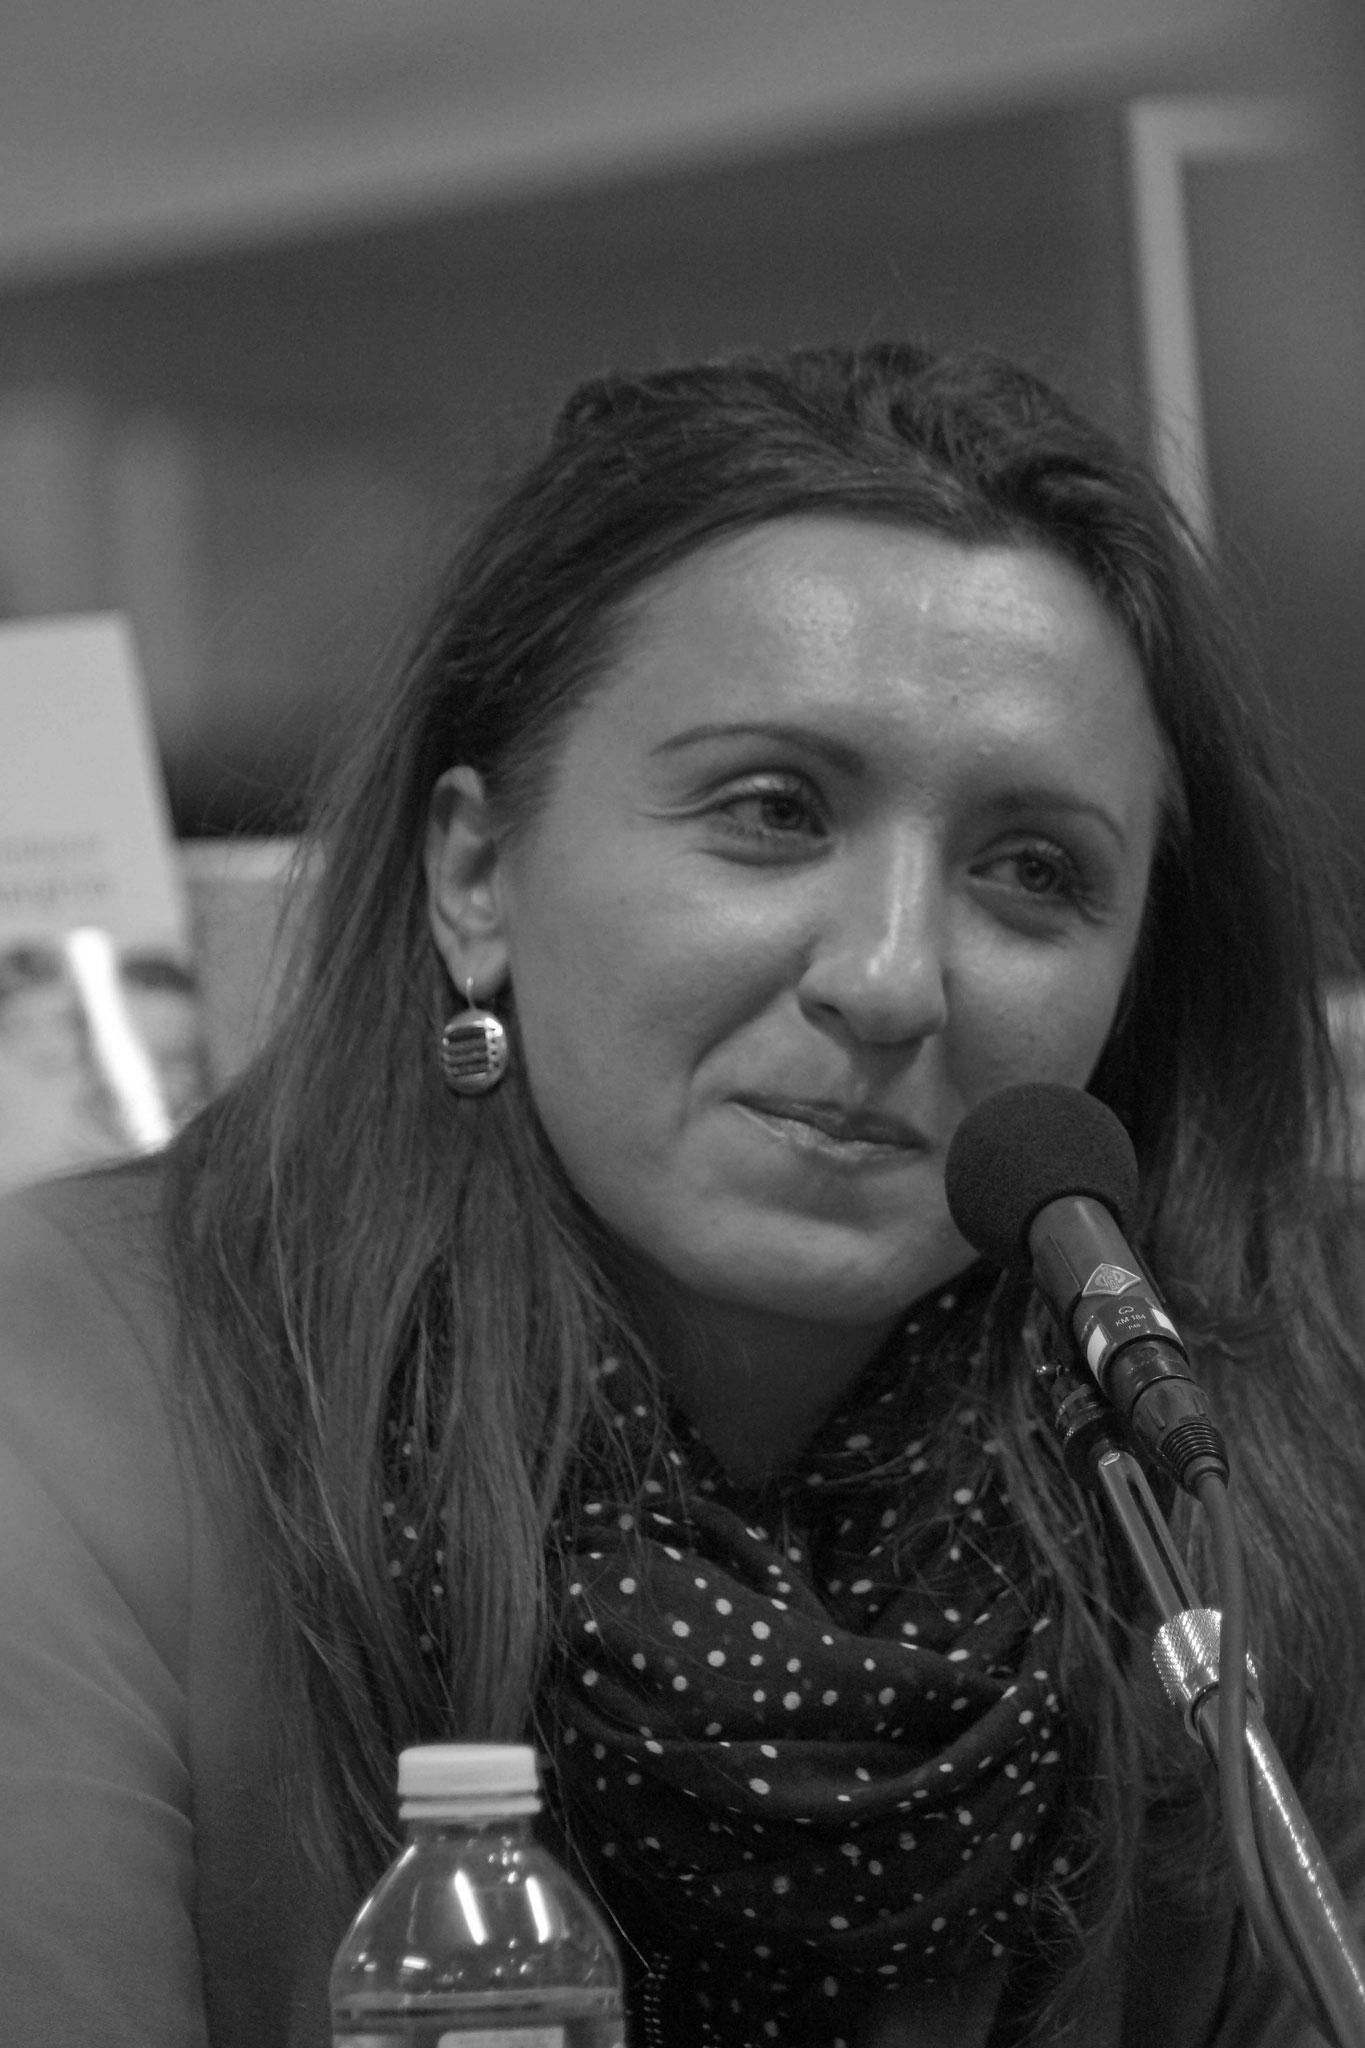 Maya Ombasic ~ Rencontre à la Librairie Gwalarn pour son Auto portait Mostarghia ; Mardi 14 mars 2017